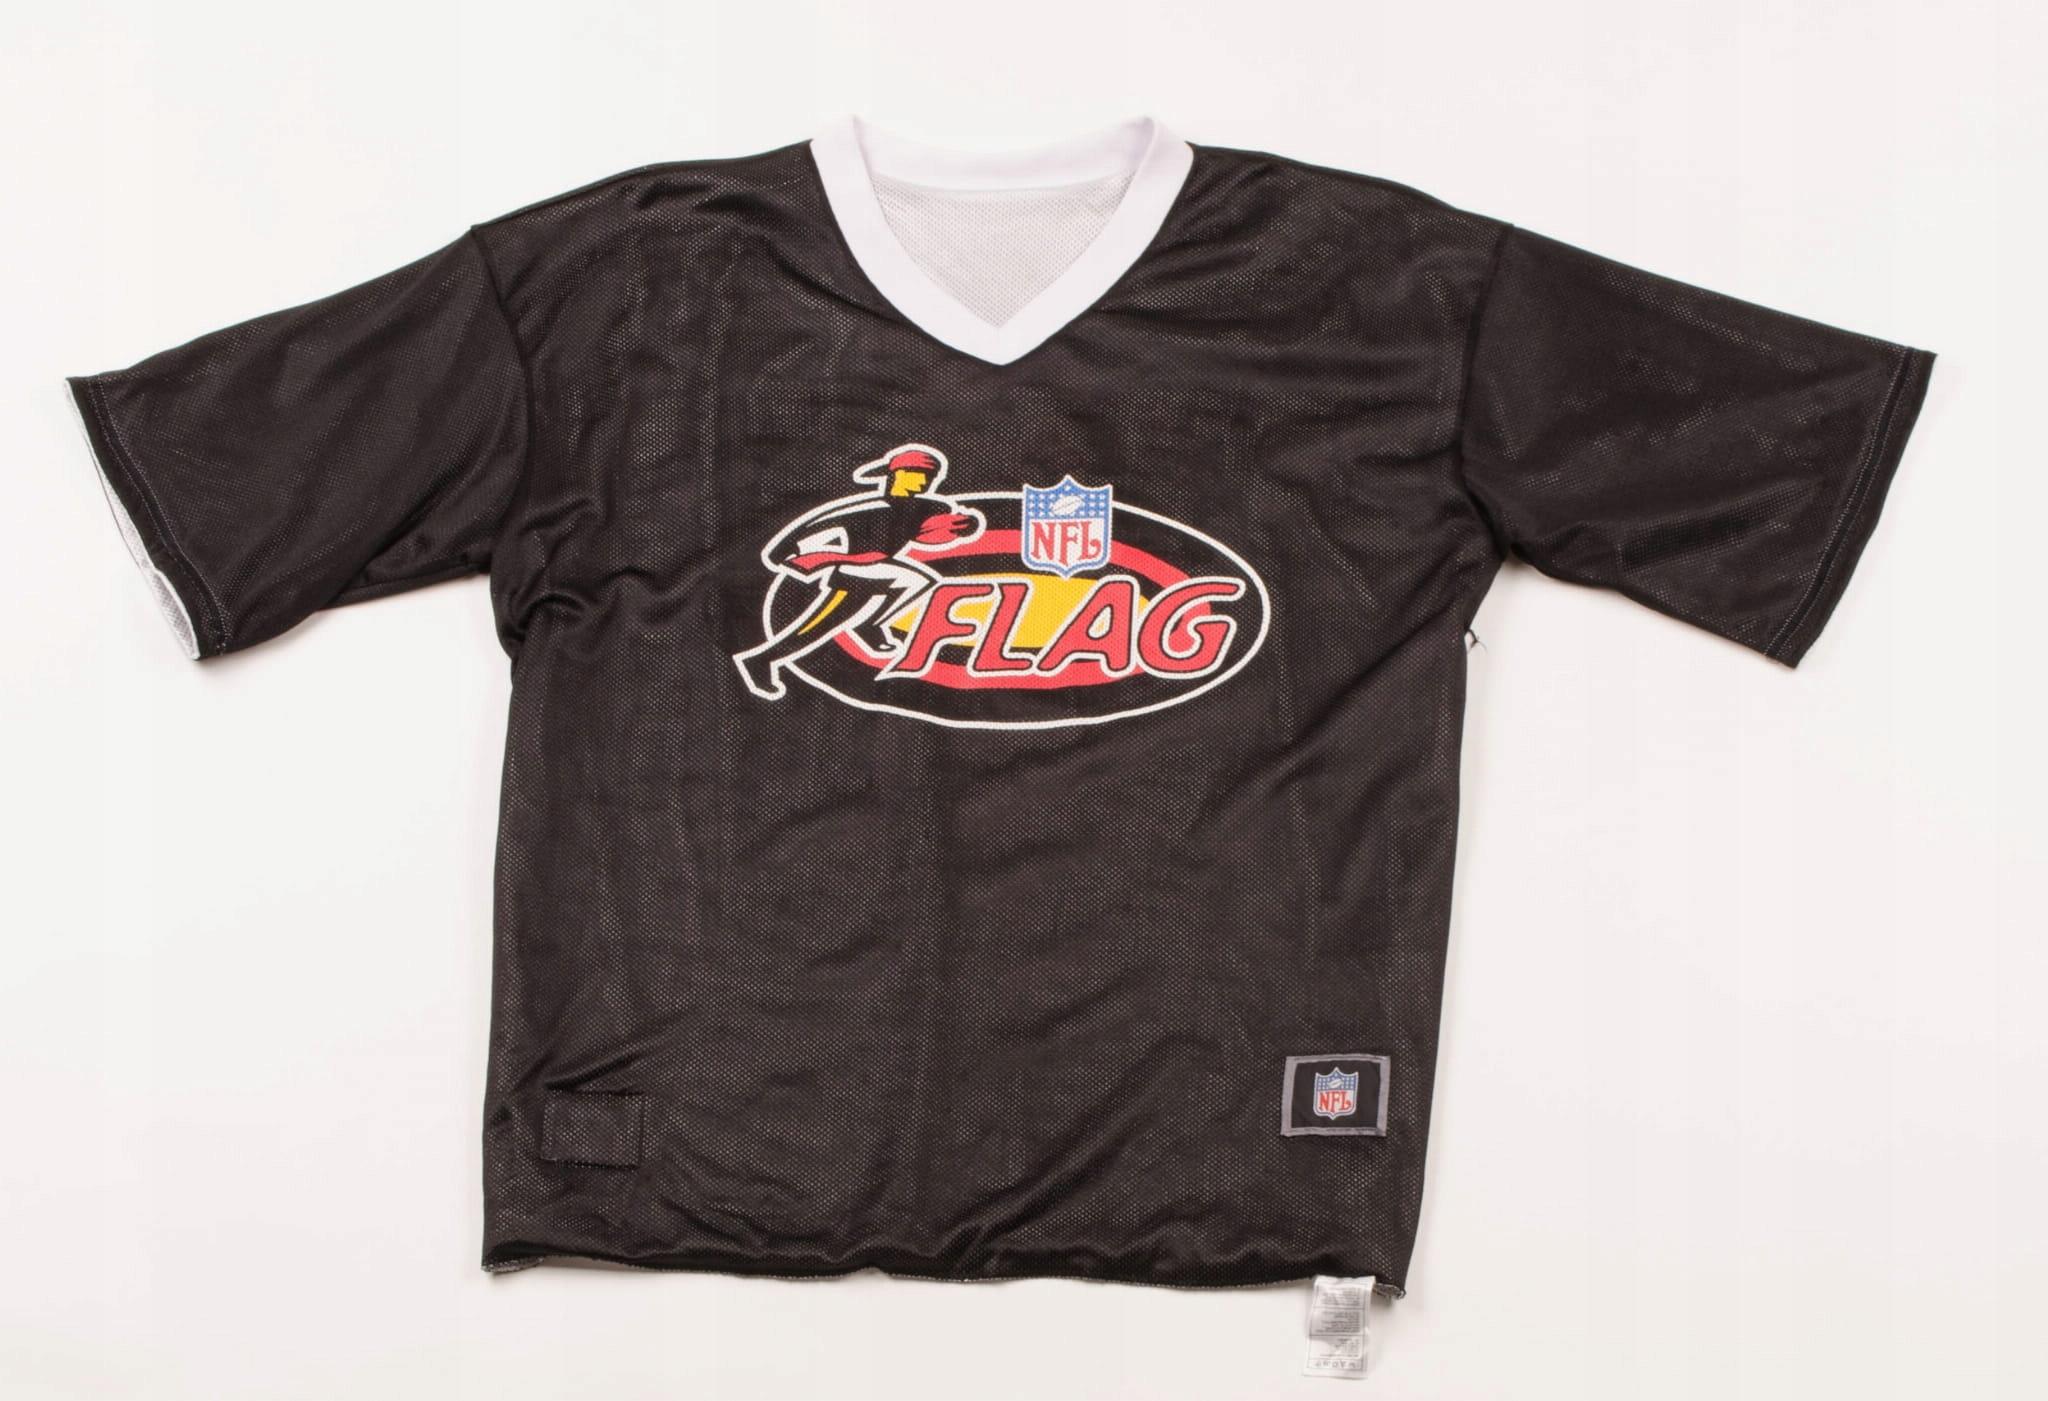 21819 NFL T-shirt Koszulka Męska L